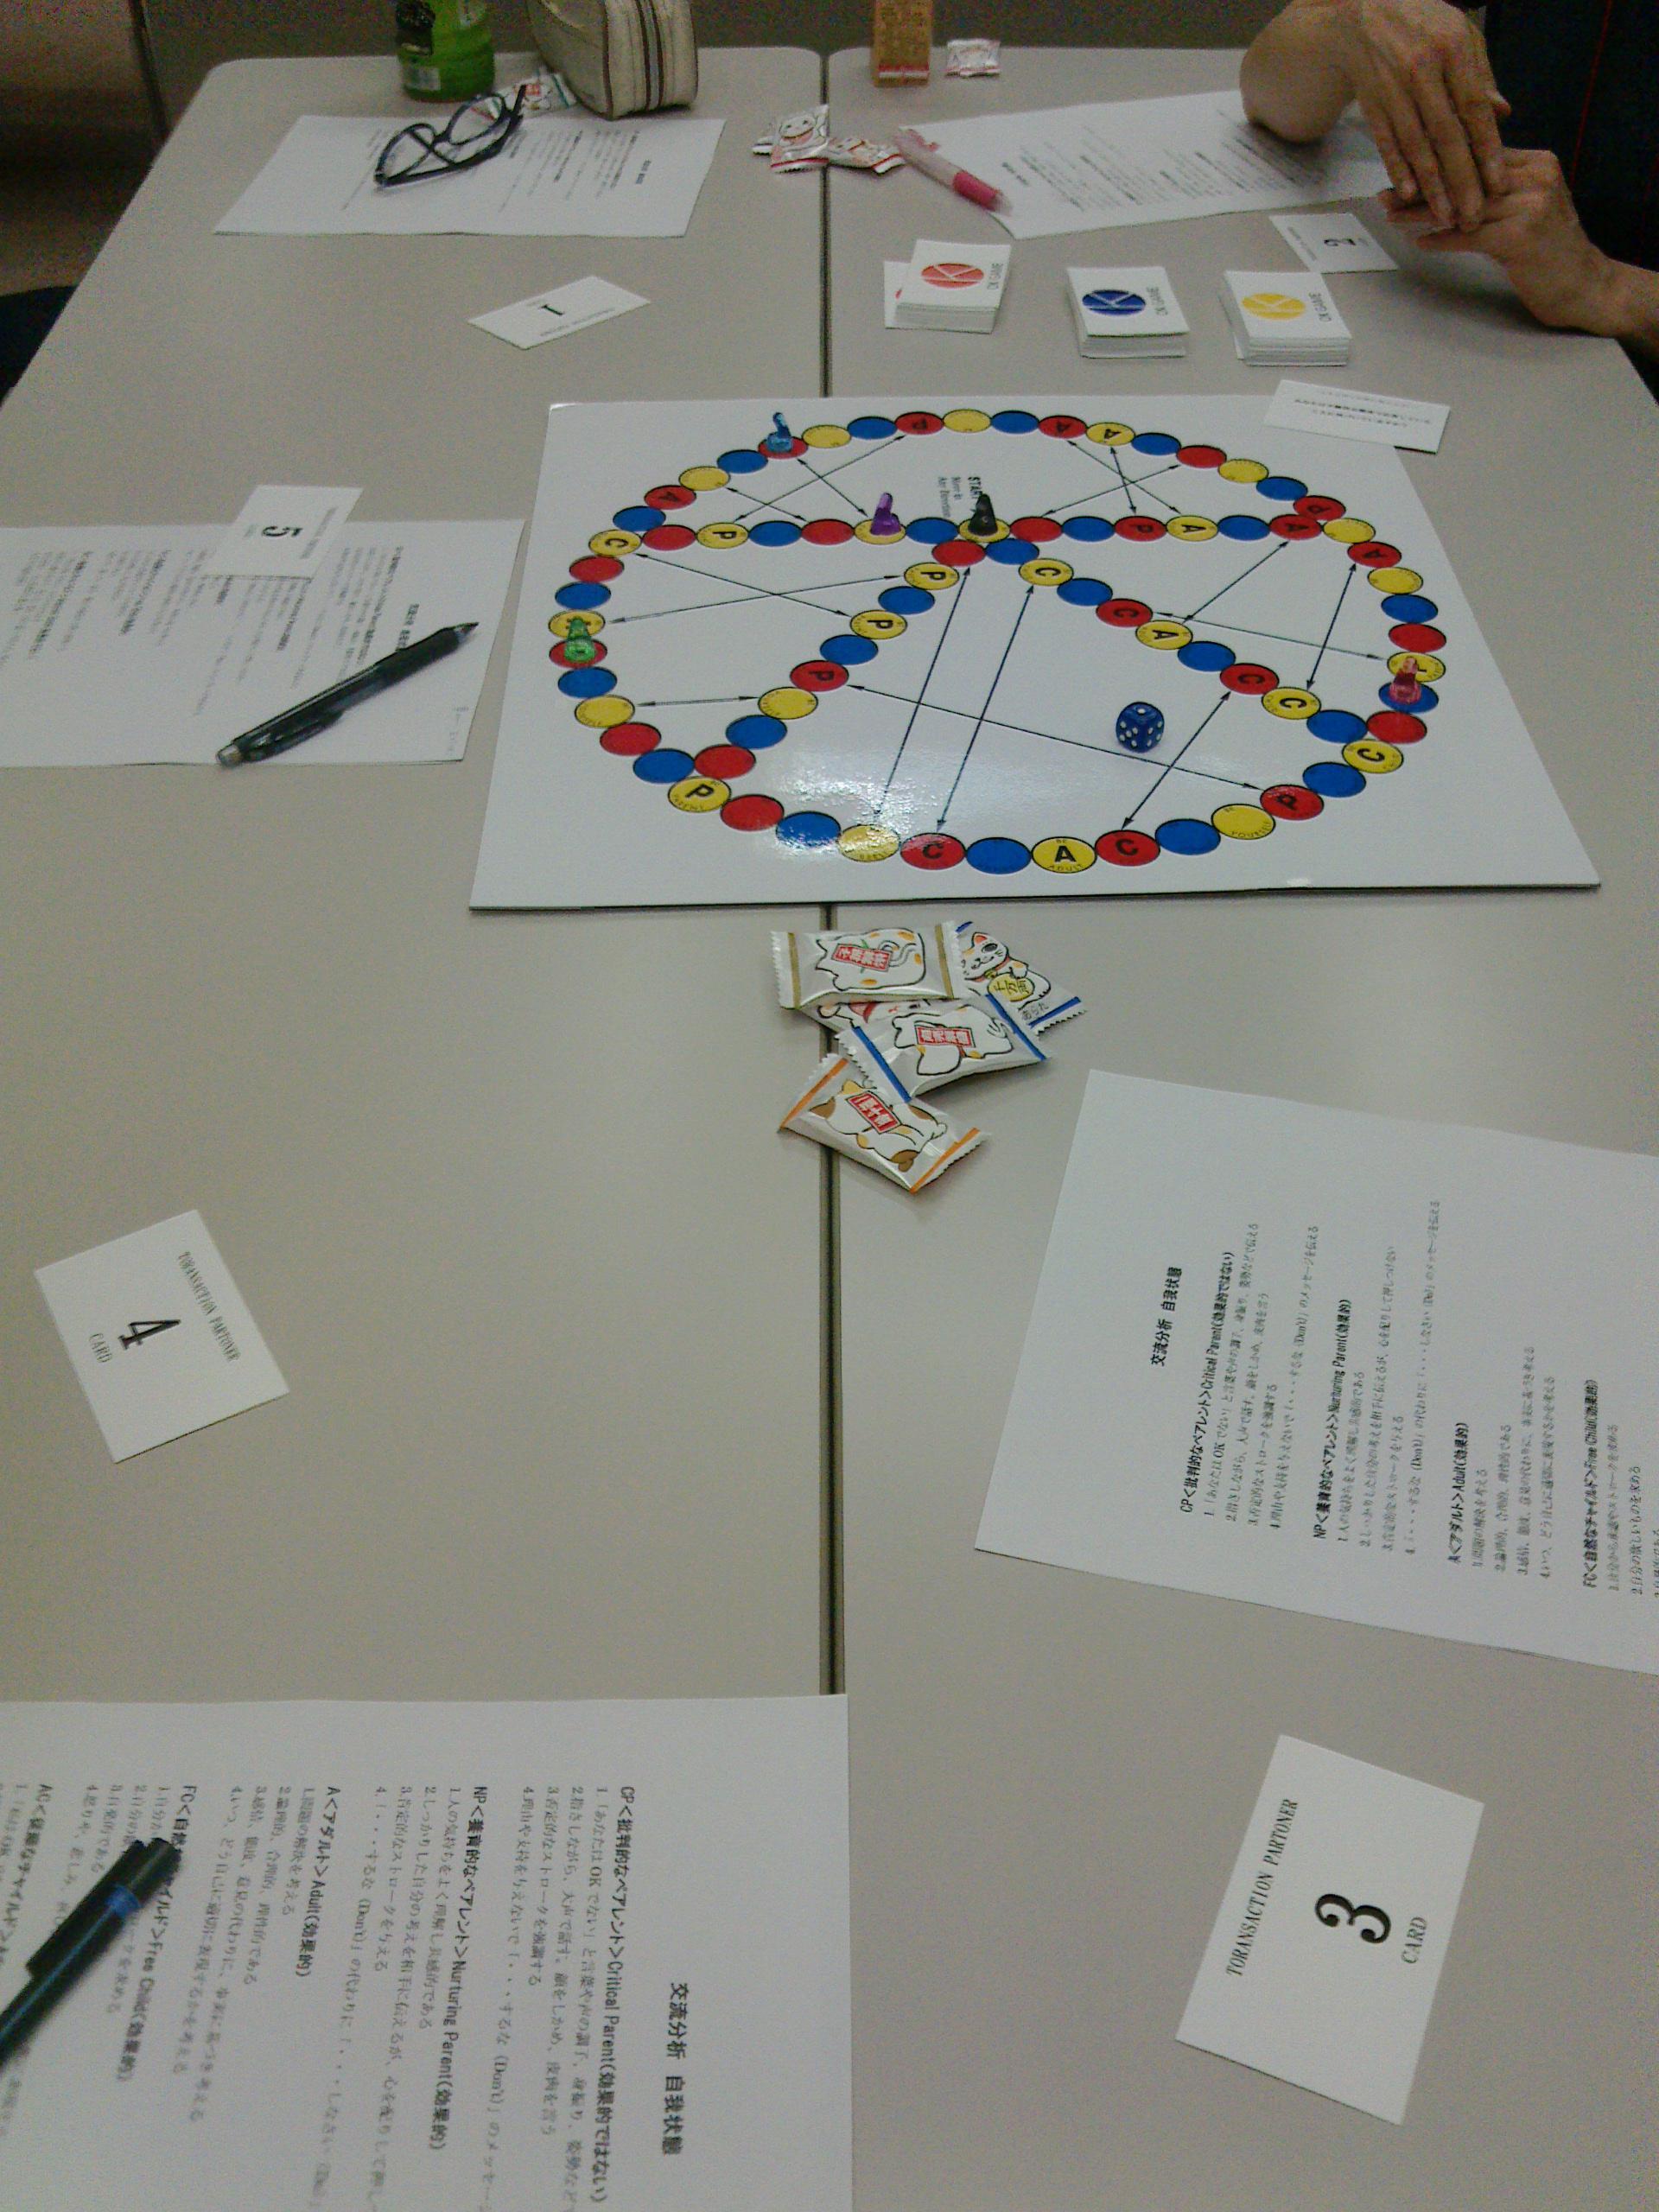 'OKゲーム'から学ぶコミュニケーション講座